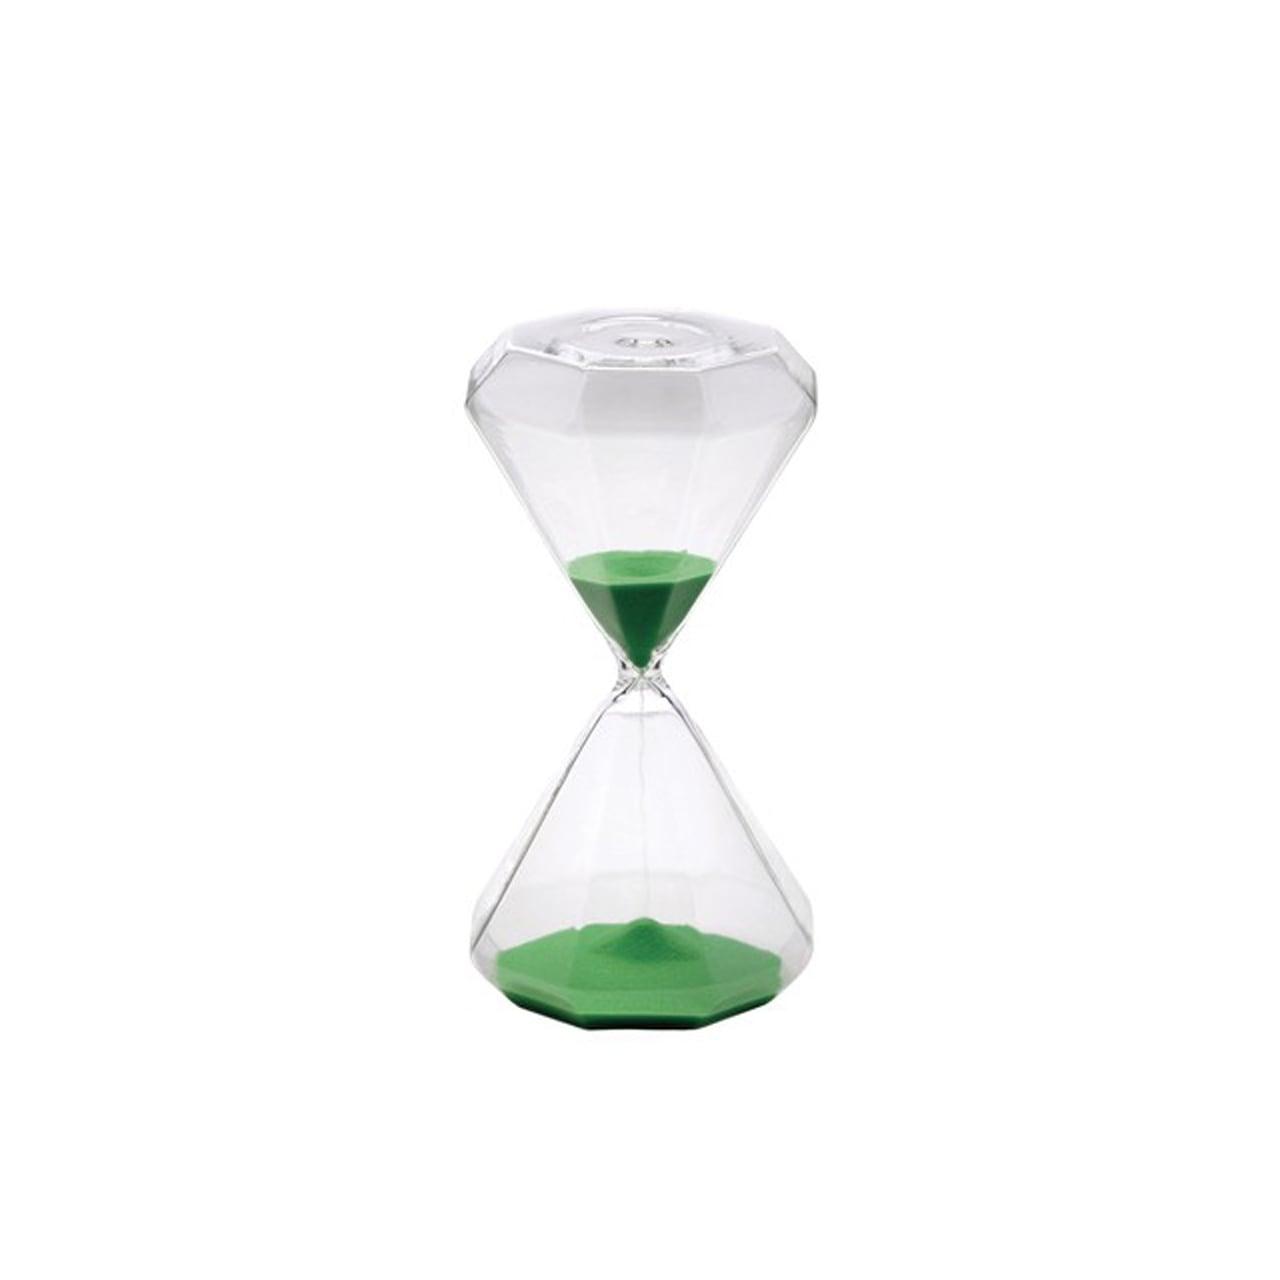 BITOSSI HOME Clessidra Hourglass 砂時計 グリーン